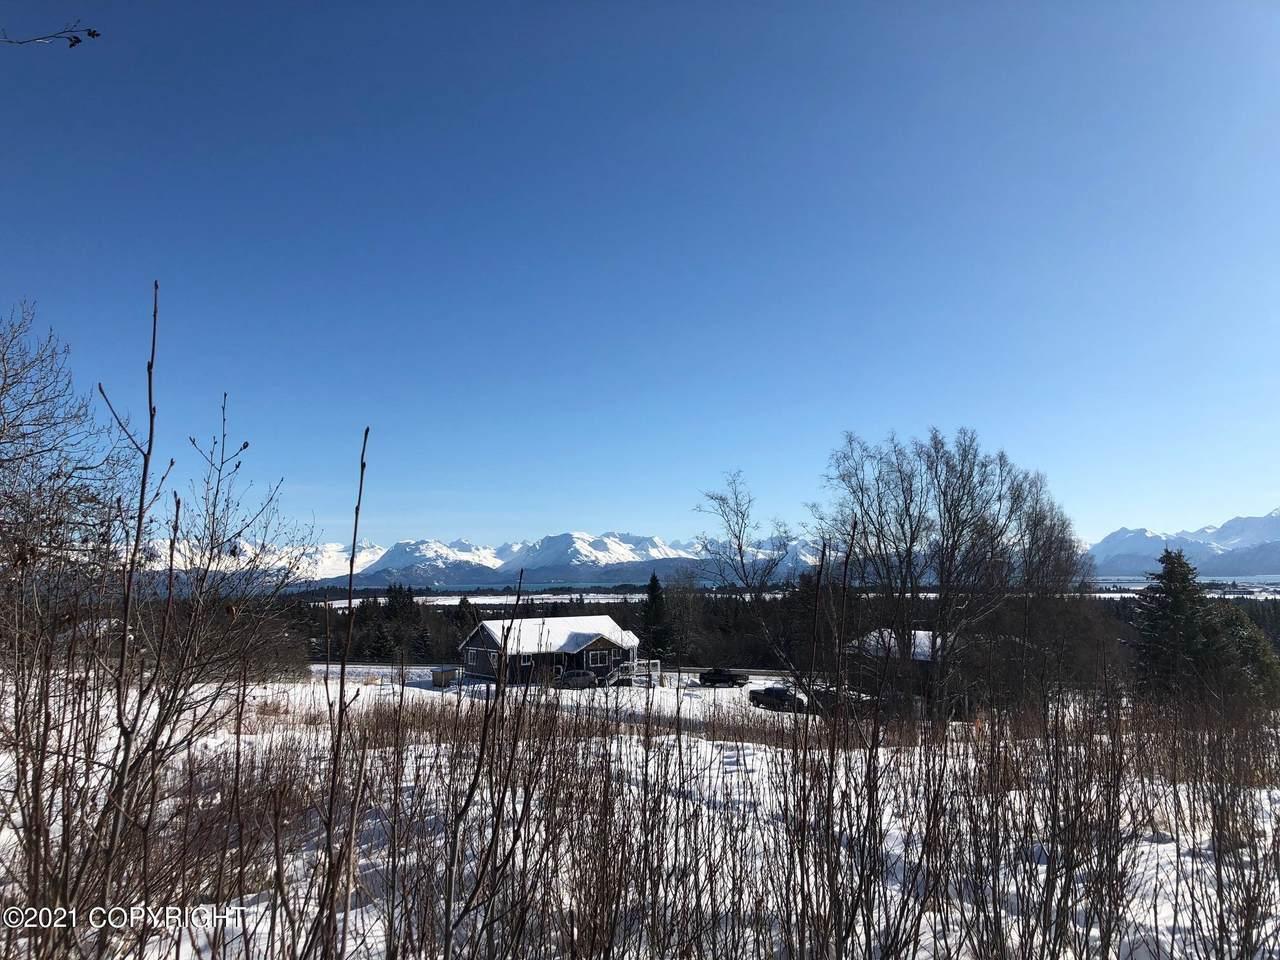 https://bt-photos.global.ssl.fastly.net/alaska/1280_boomver_2_21-2823-2.jpg